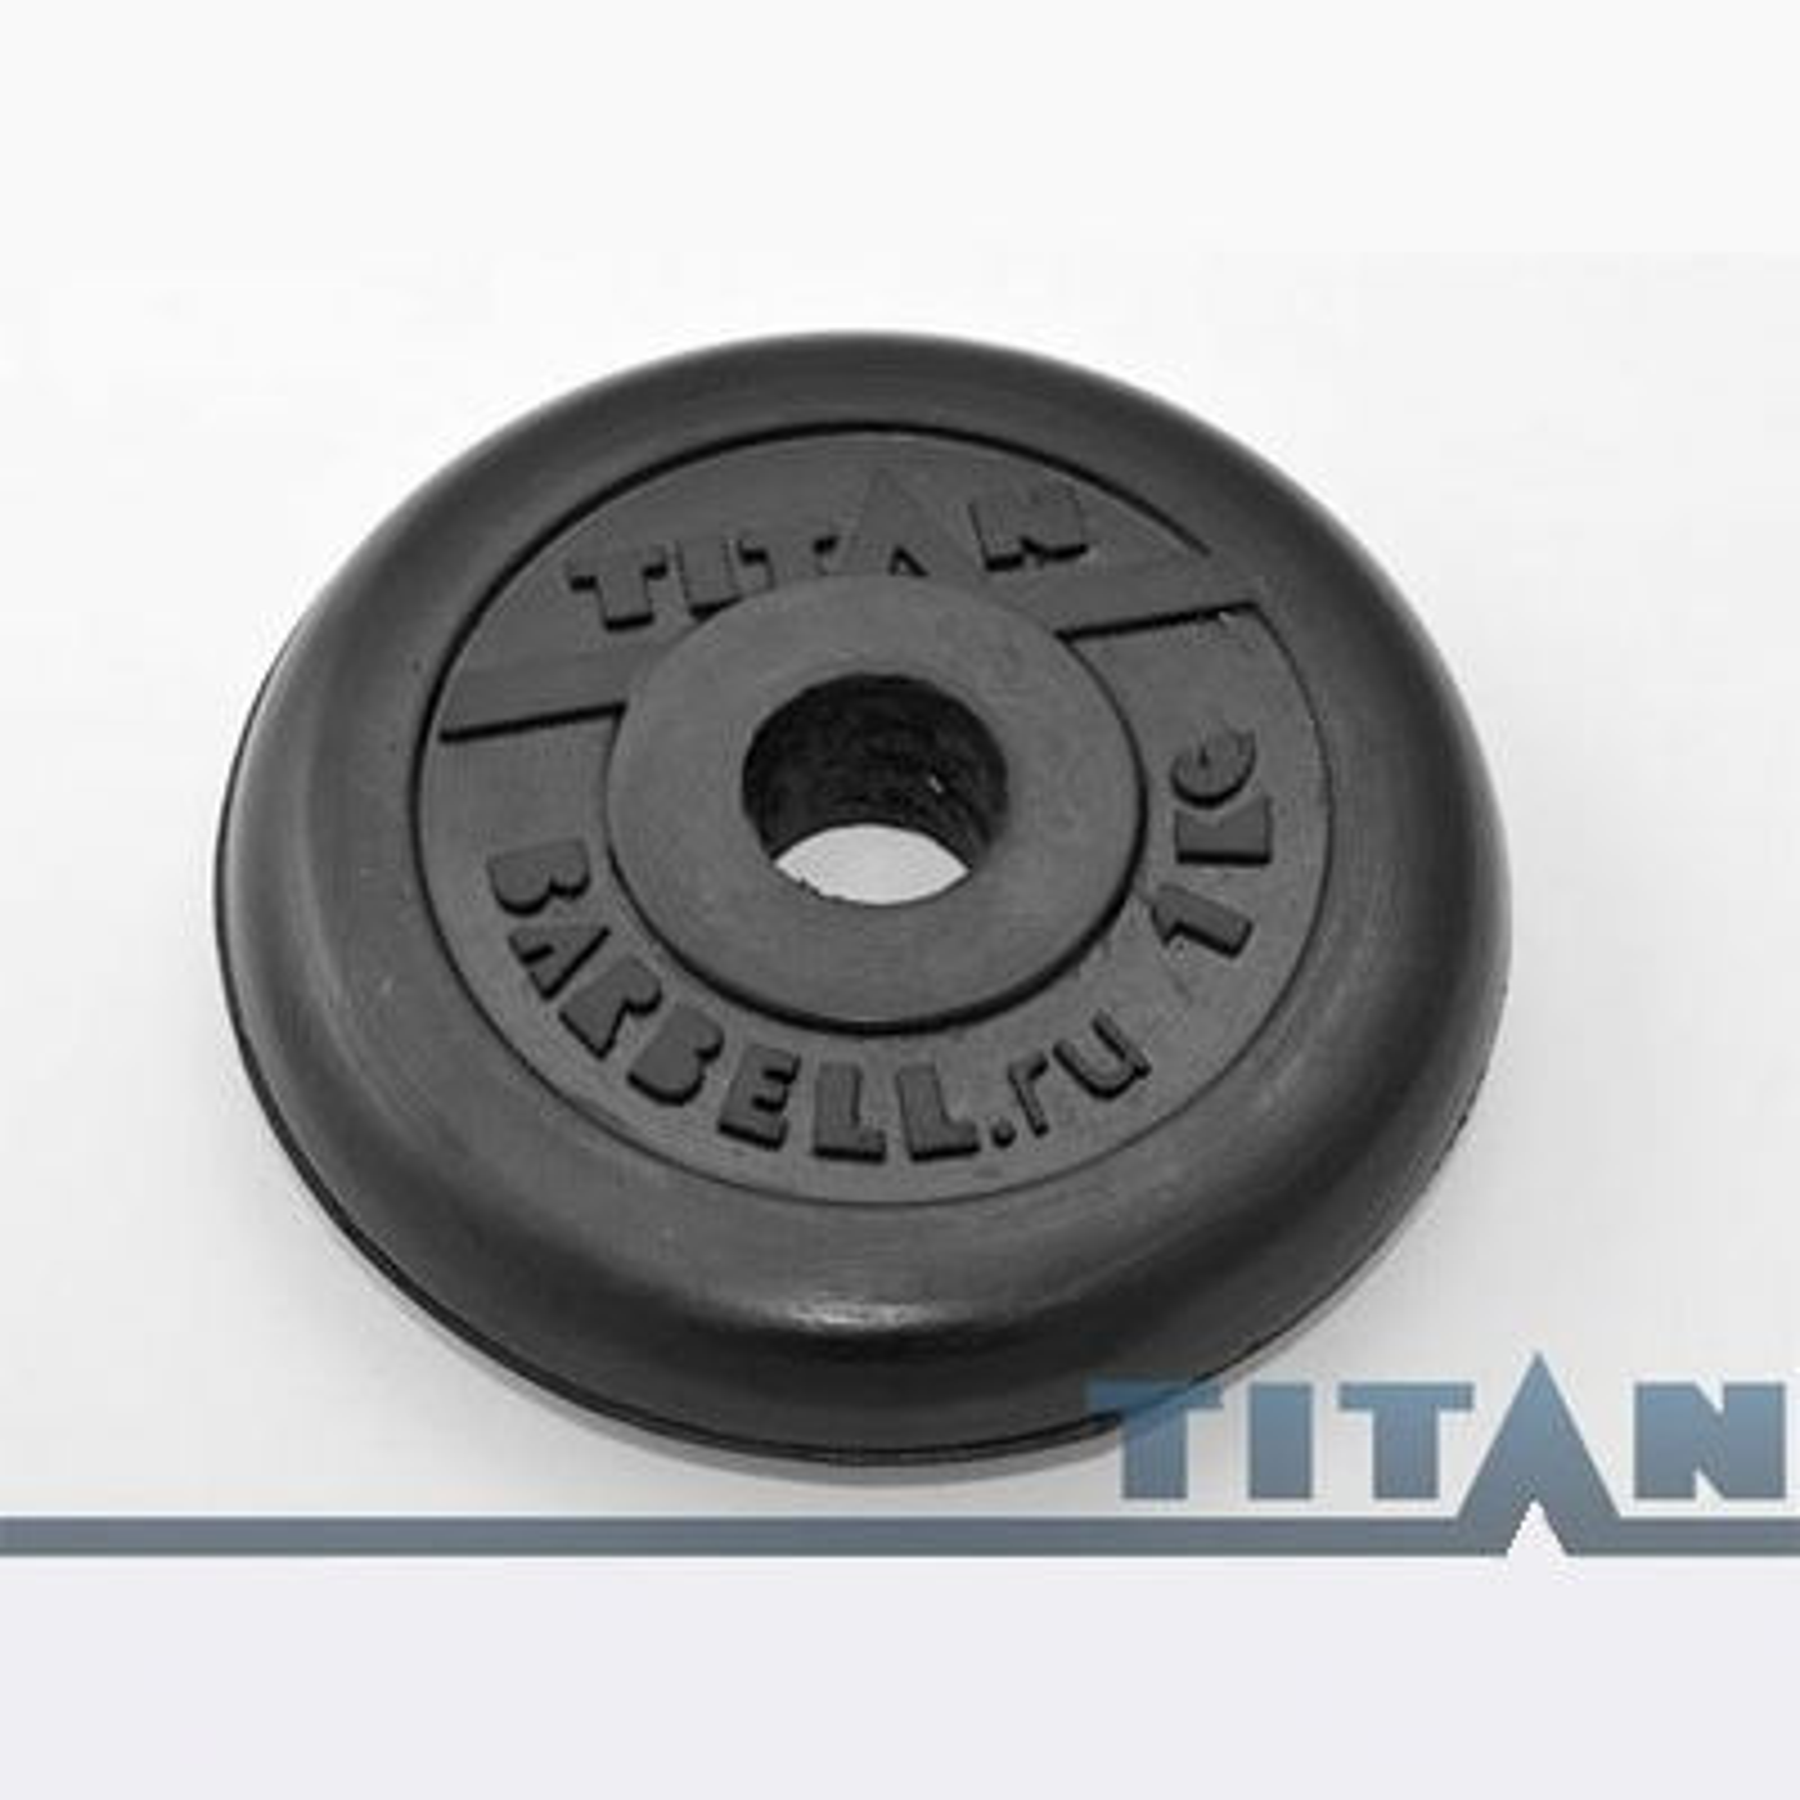 Диск обрез.чер. Титан d-26 mm.  1,00 кг.